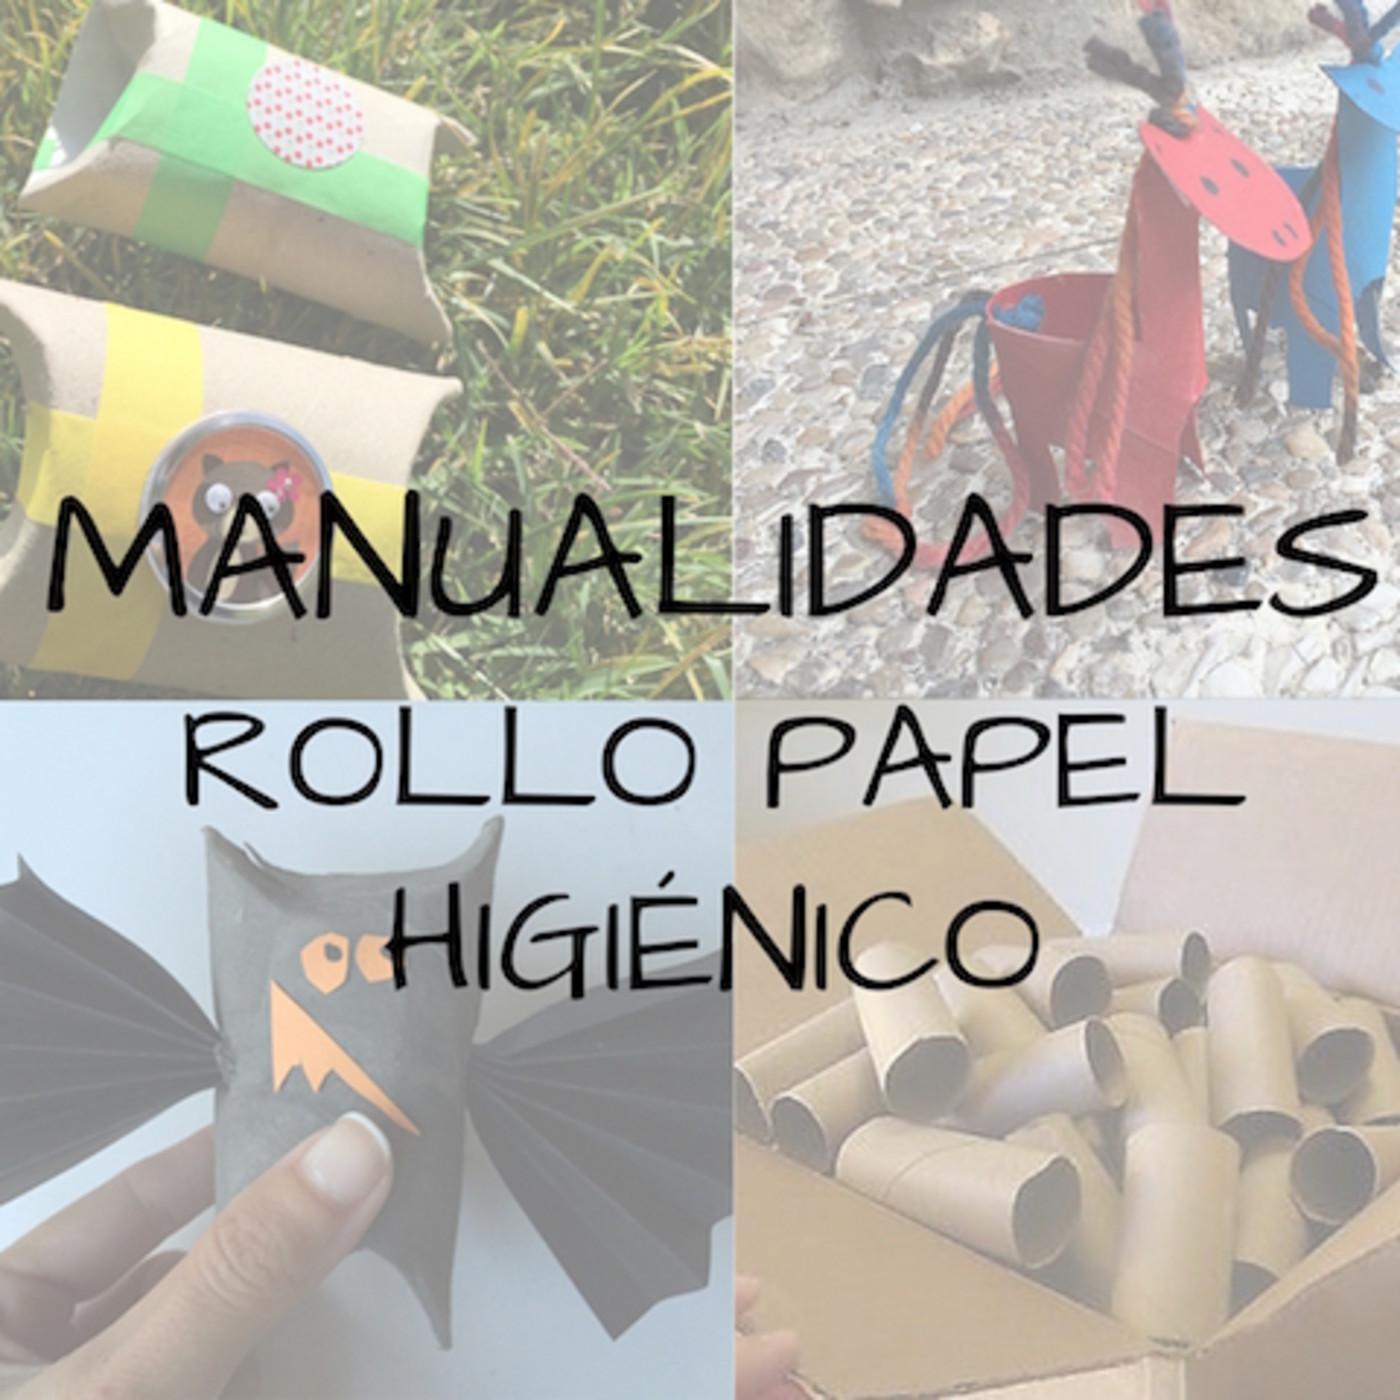 3 Manualidades Rollos Papel Higienico En Podcast Clarimanitas - Manualidades-con-rollos-papel-higienico